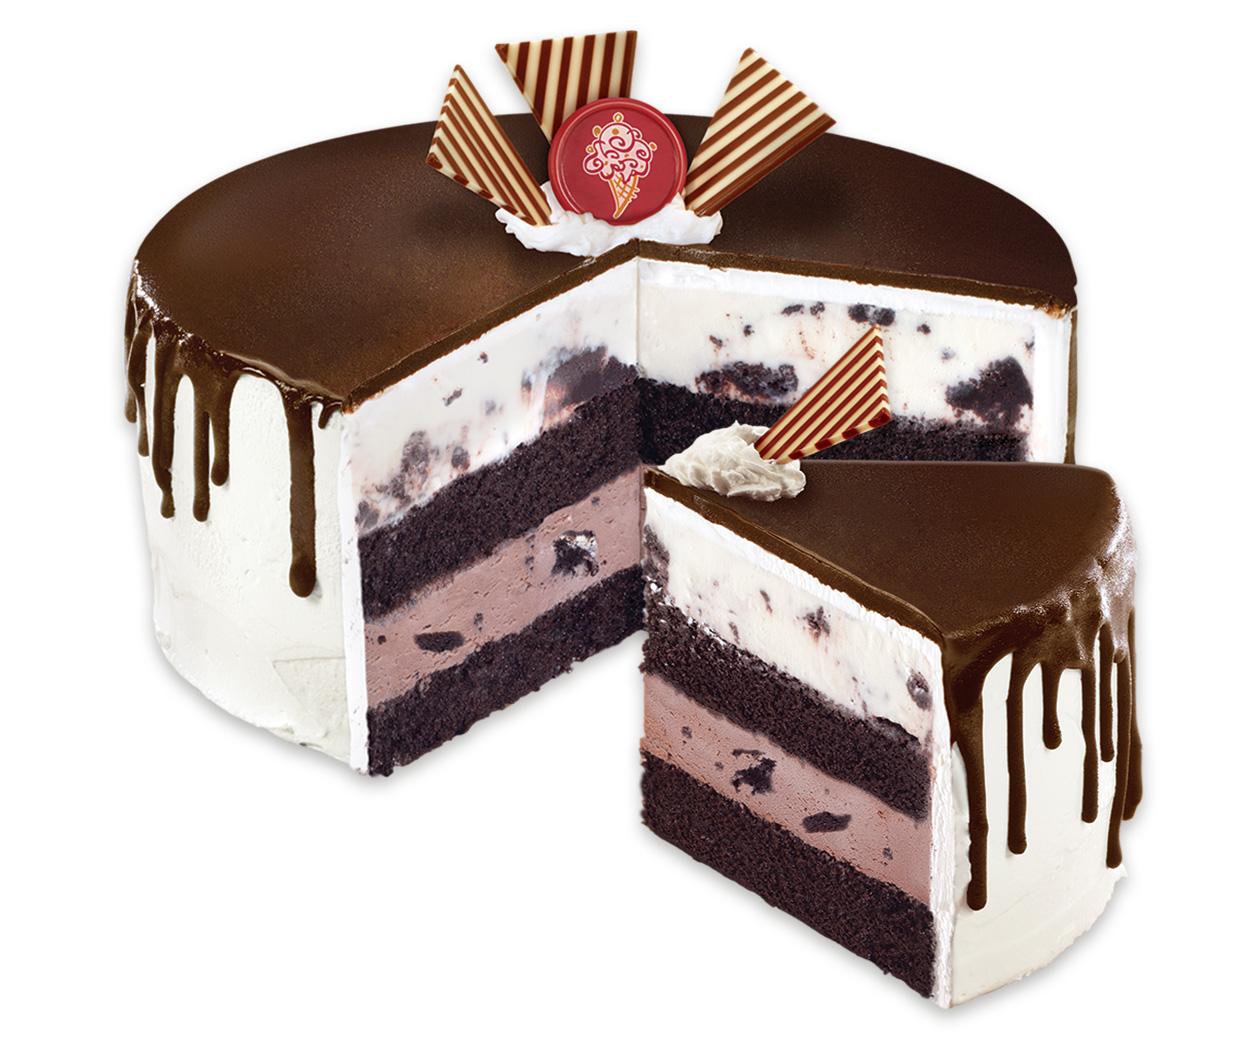 Cheap Ice Cream Cakes